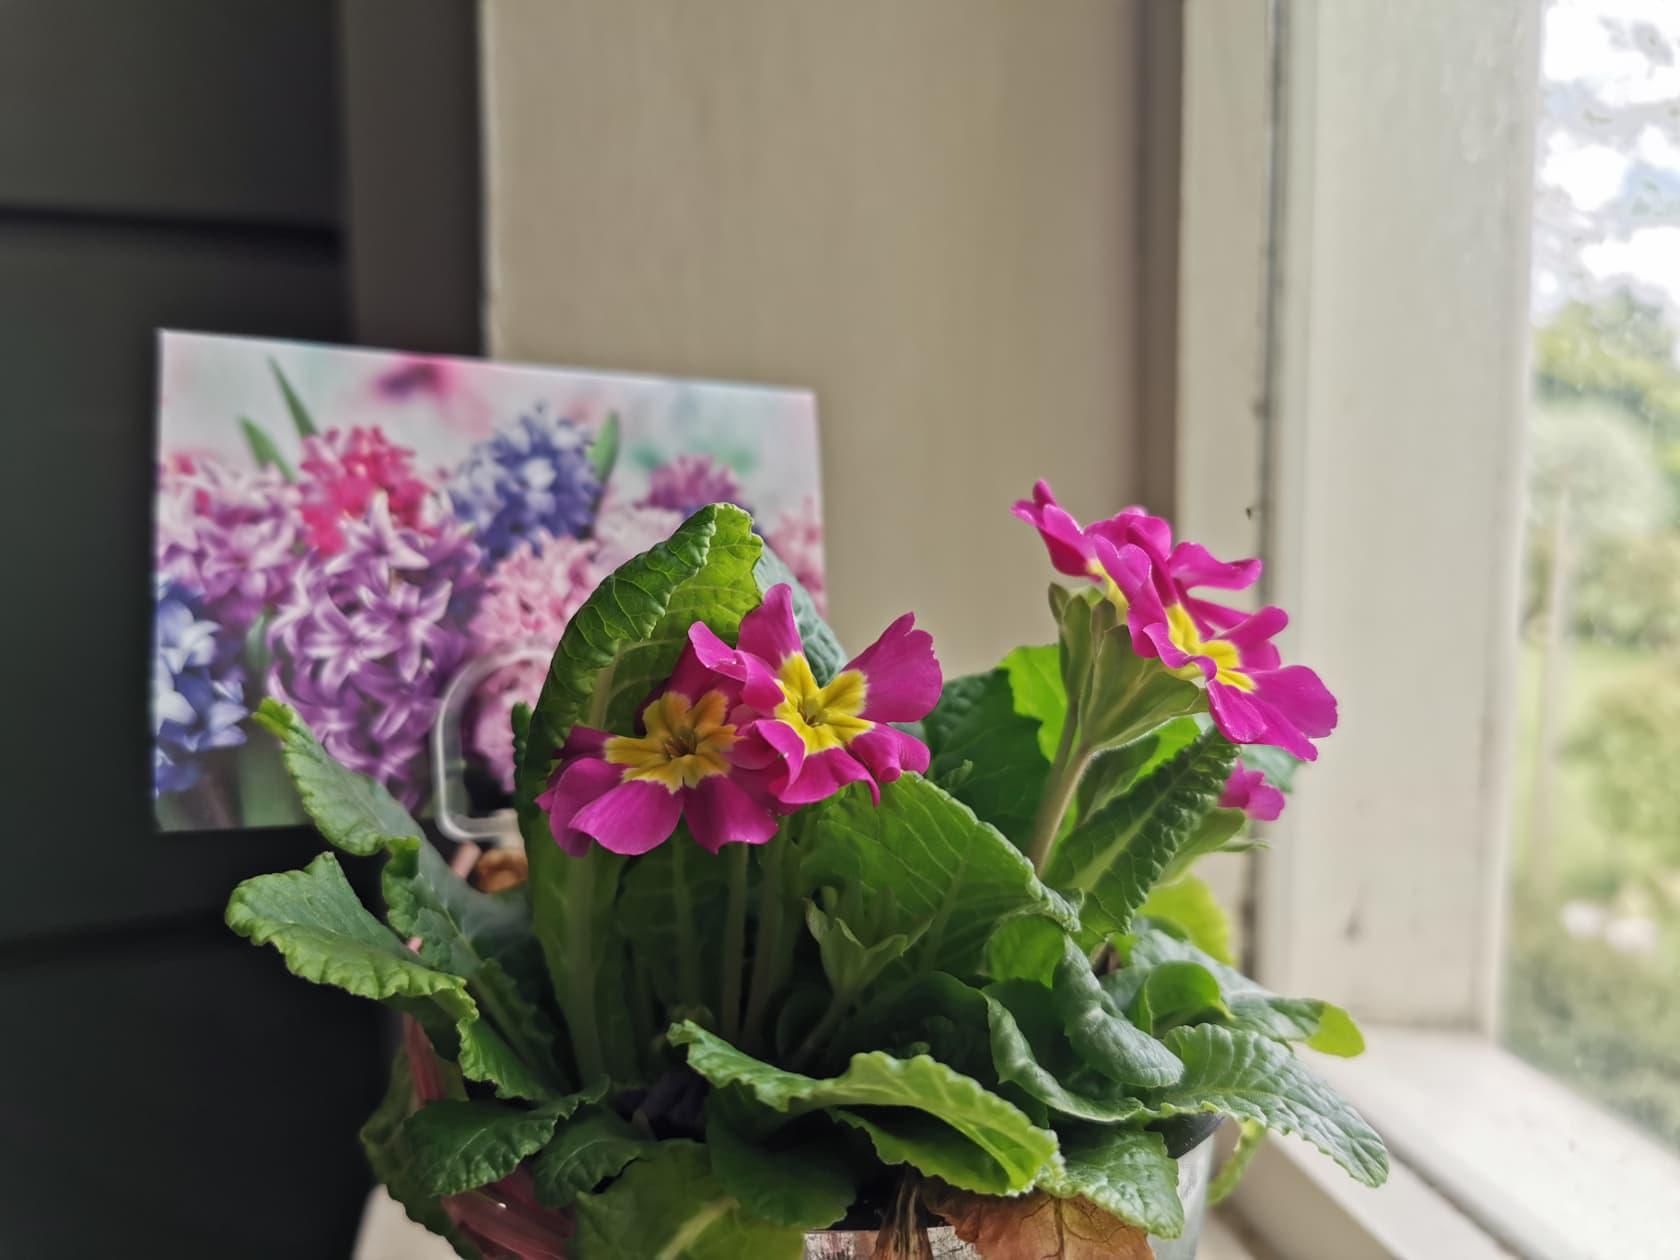 Huawei P30 Pro camera sample flower close up